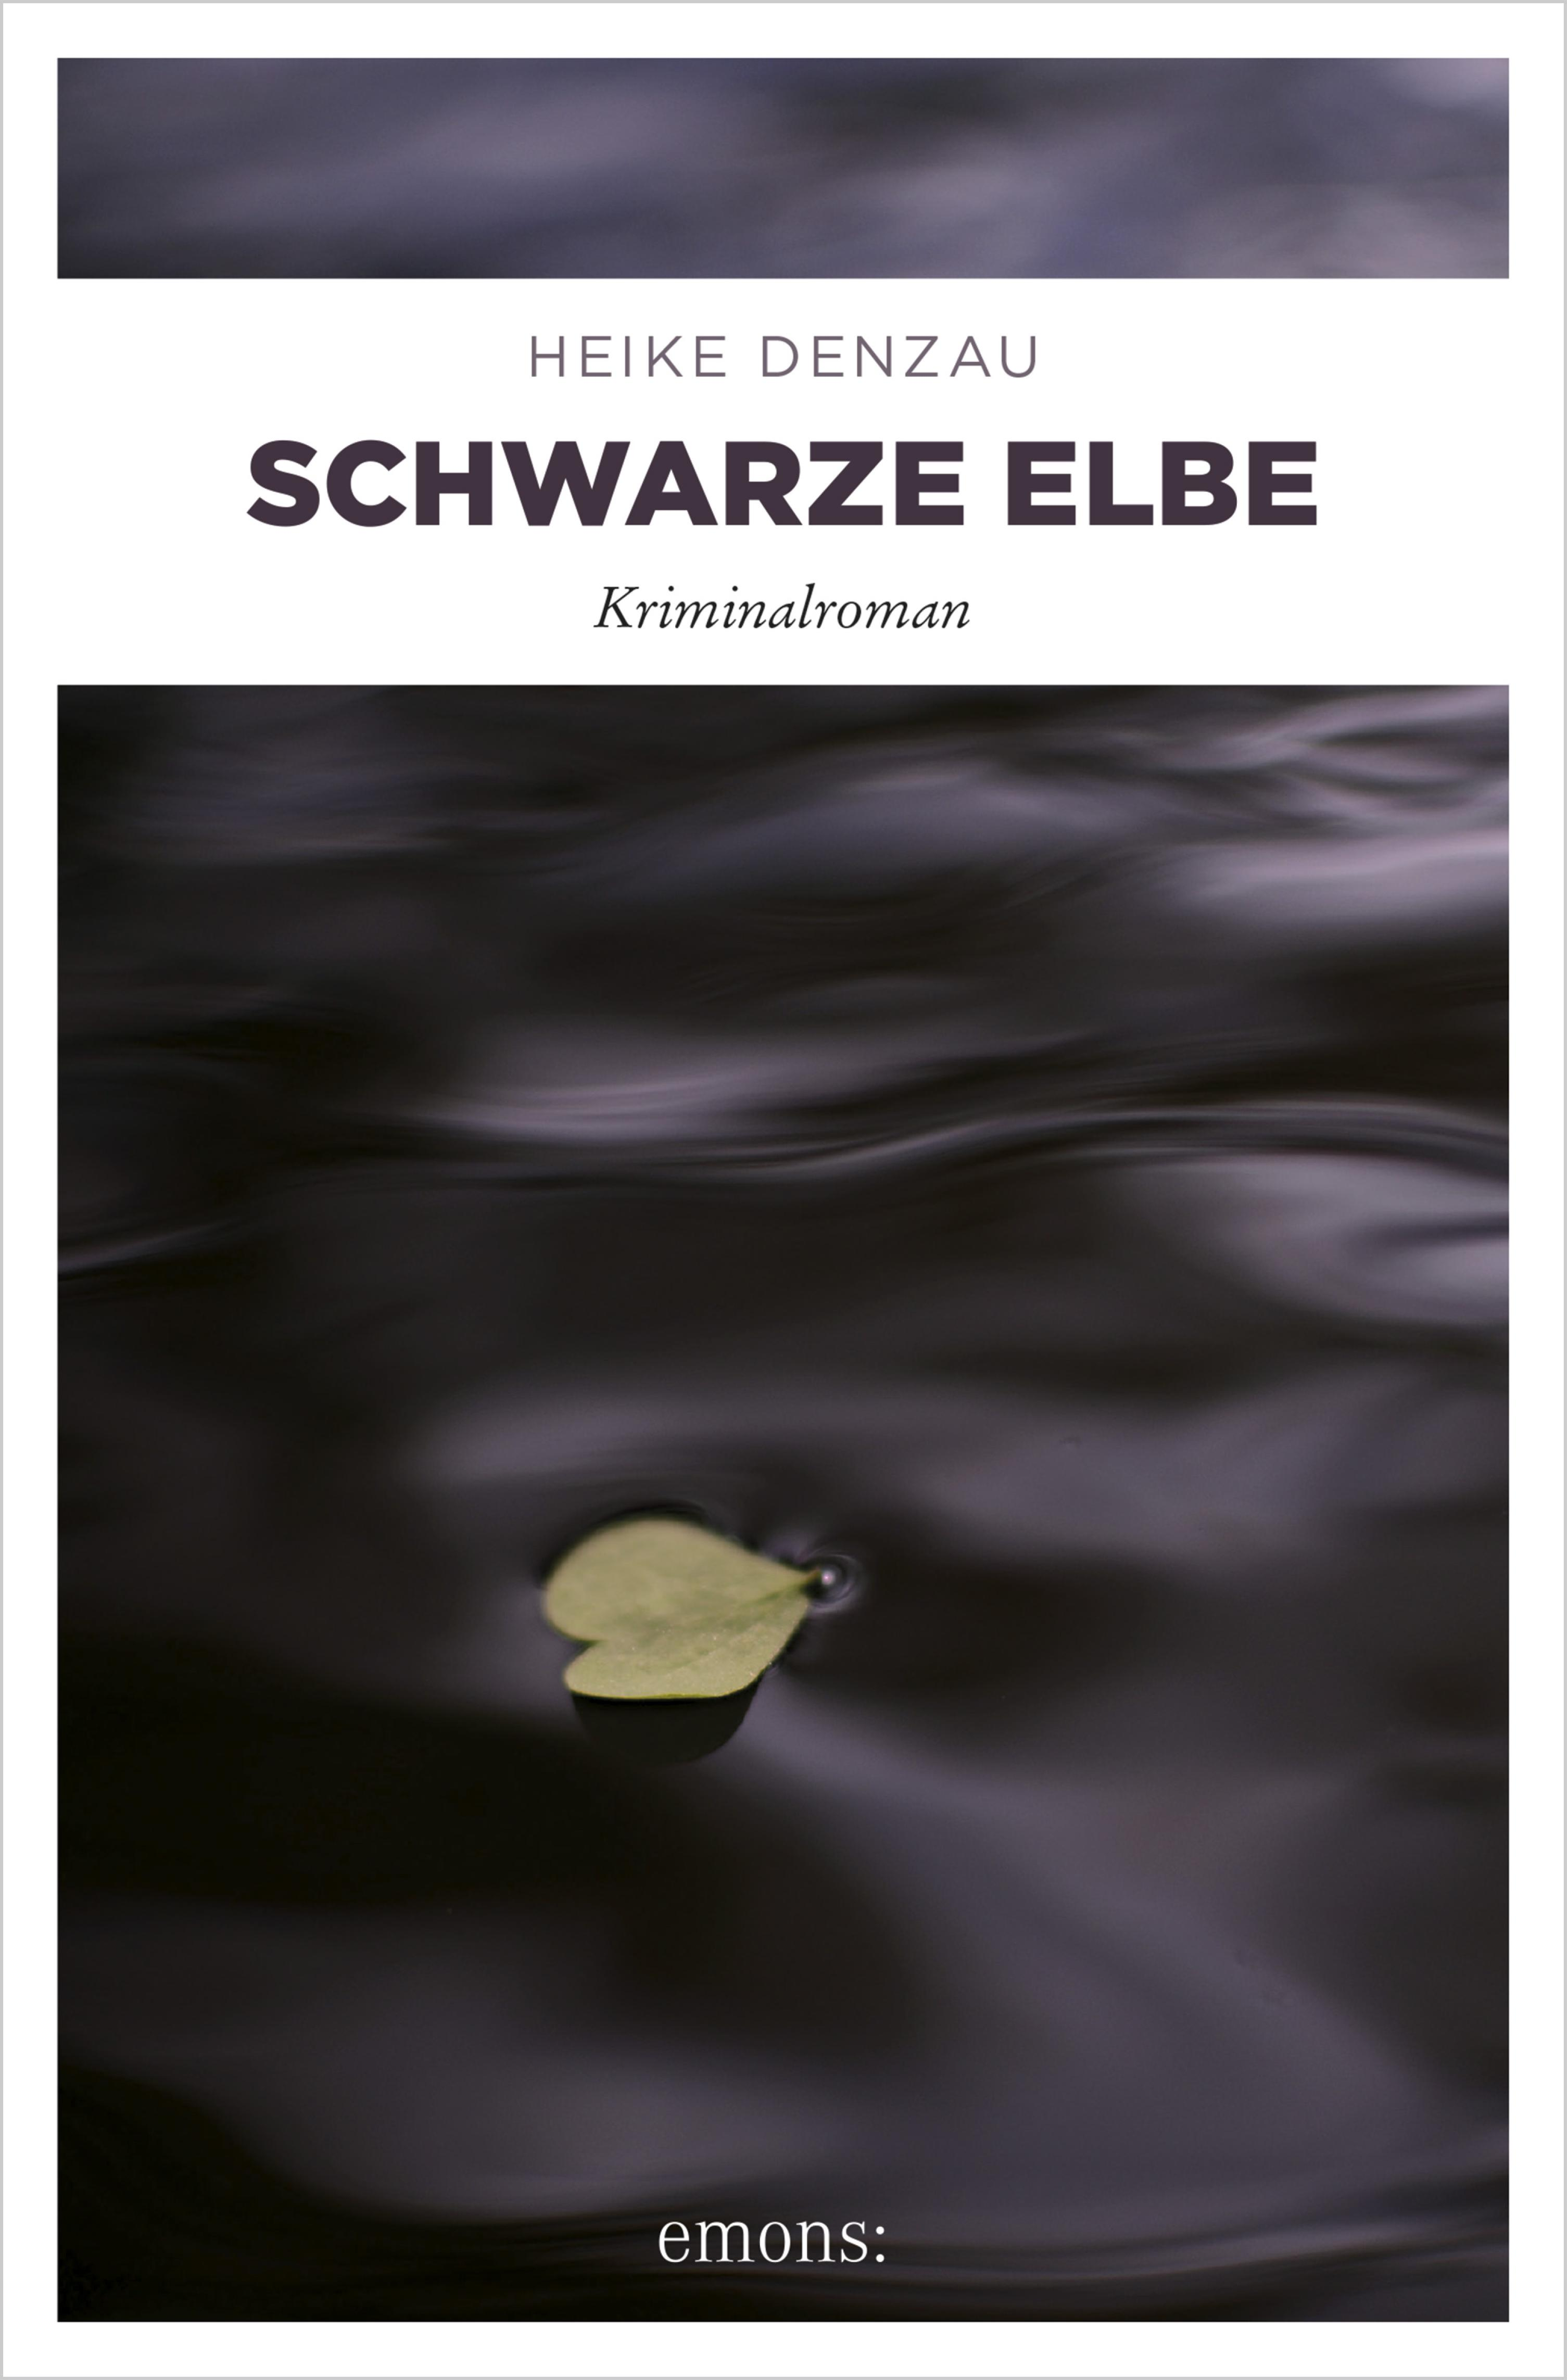 Heike Denzau Schwarze Elbe